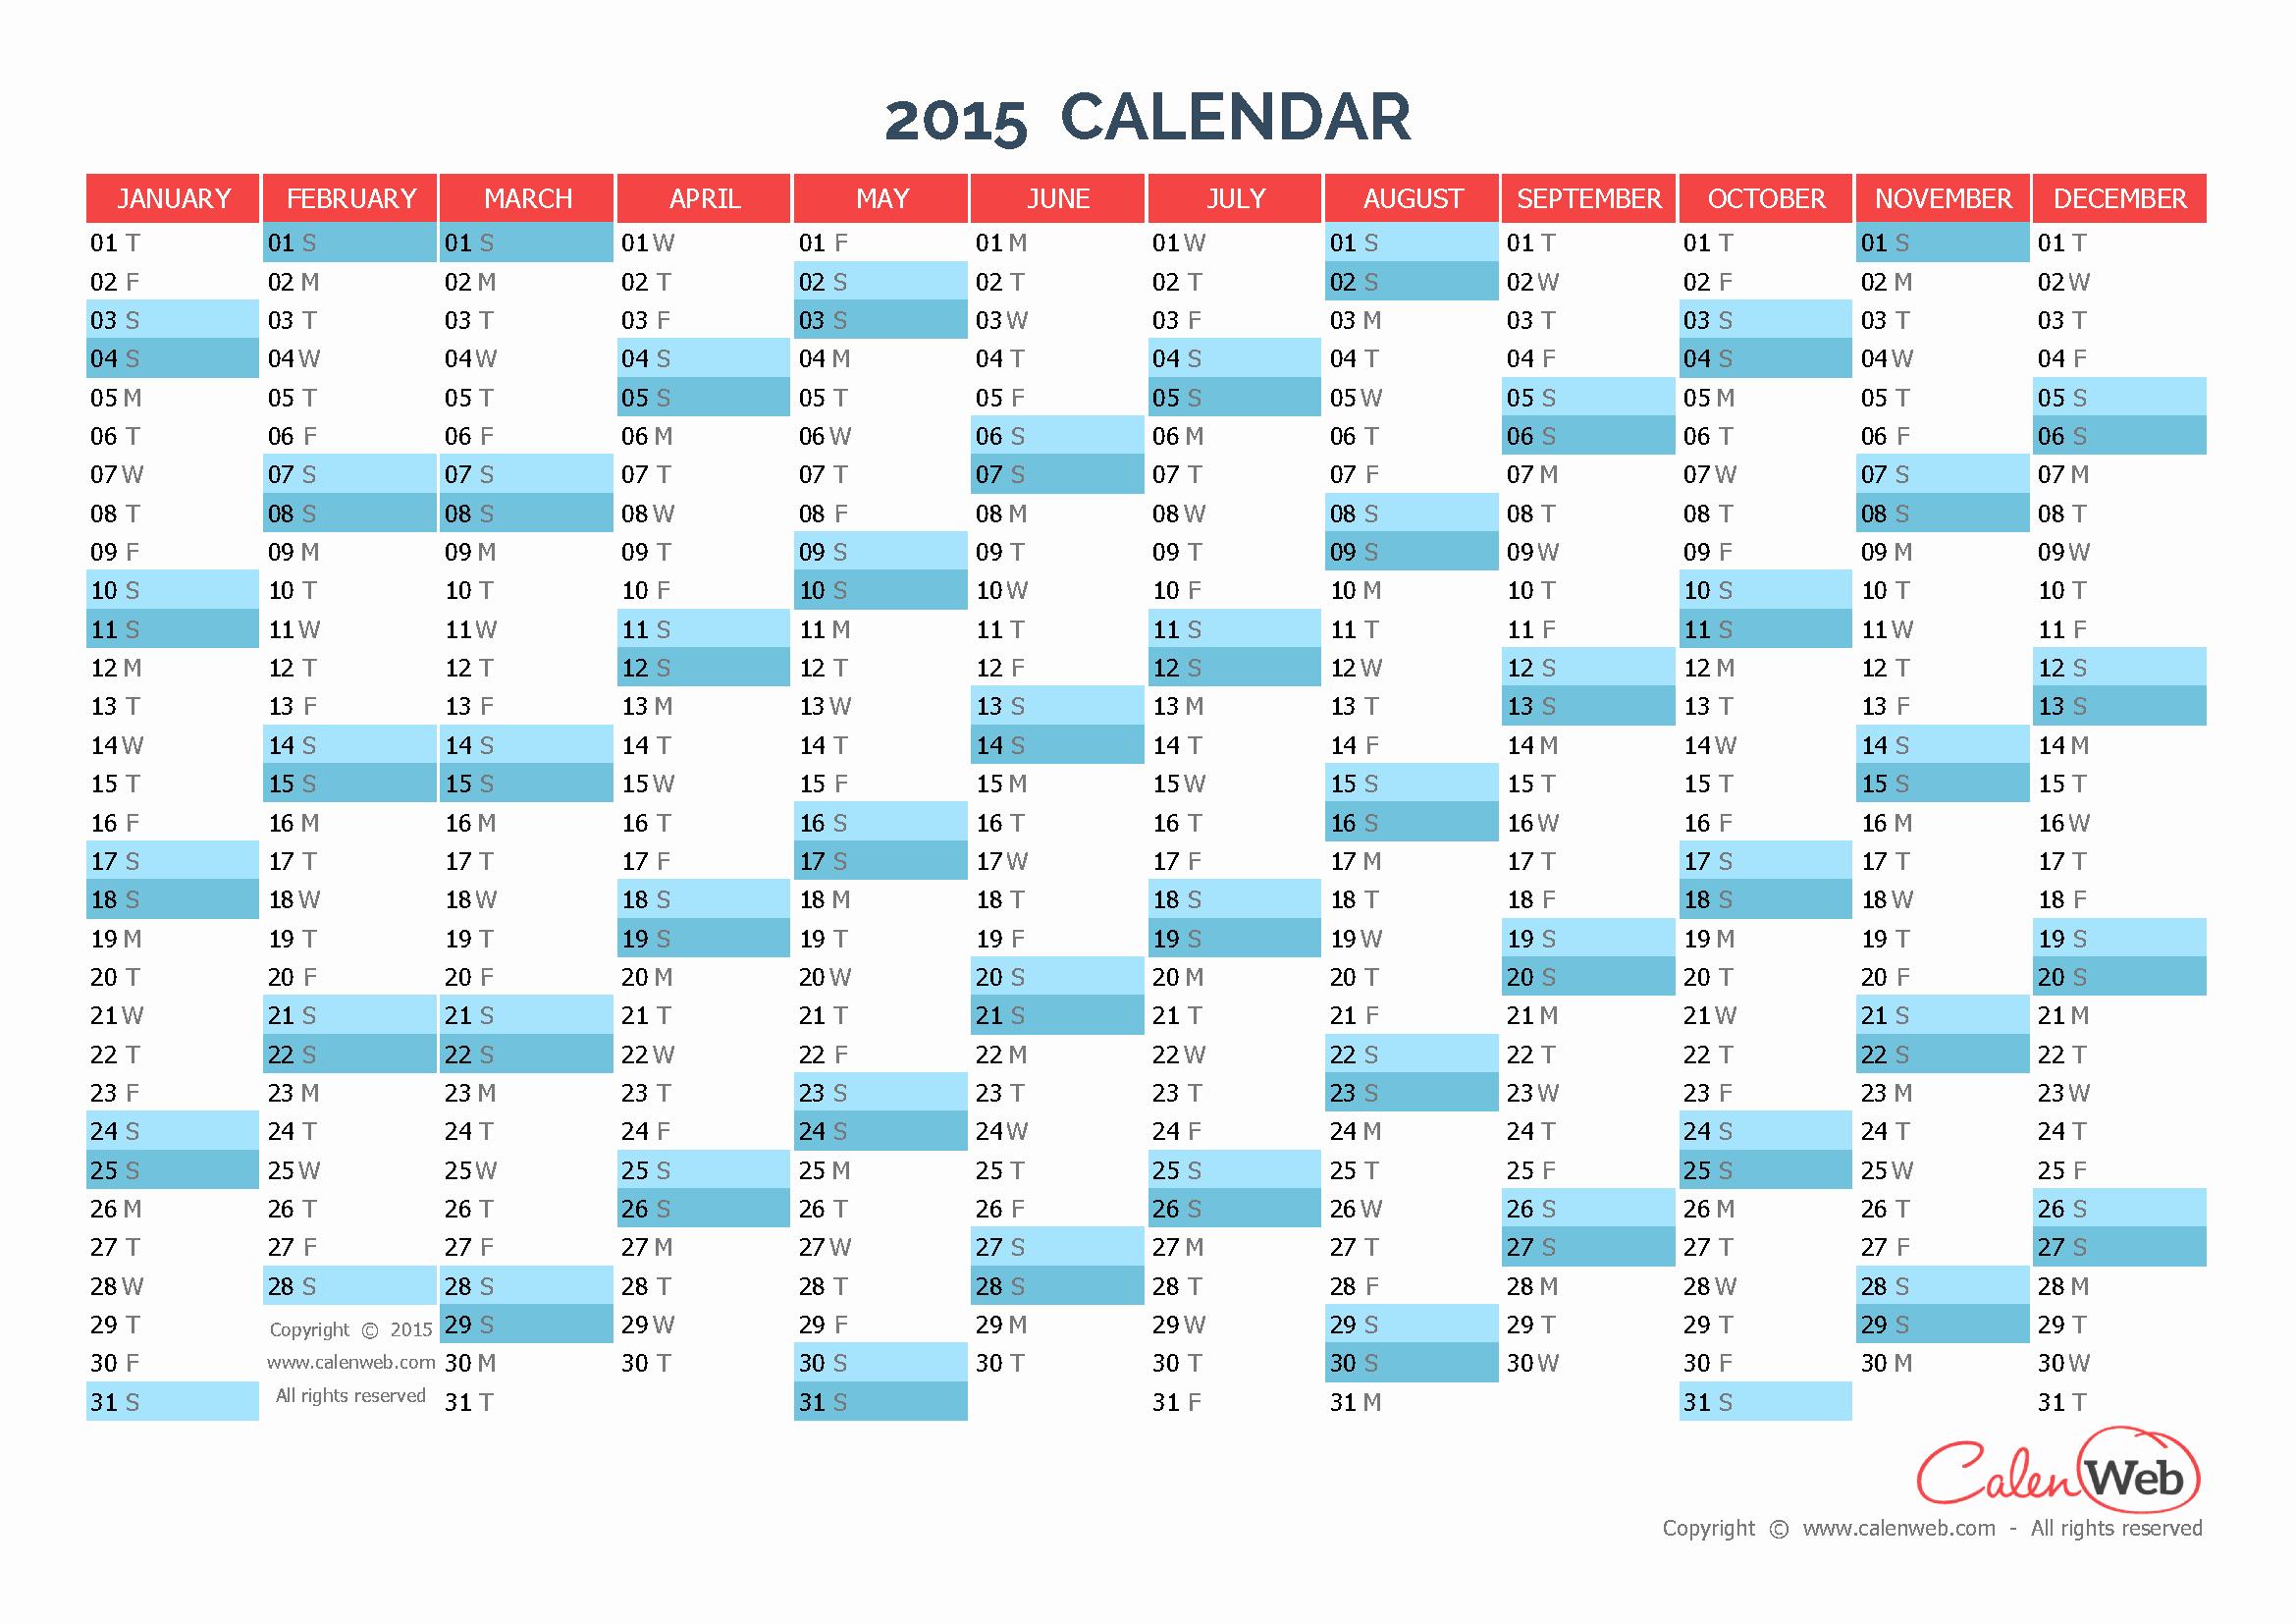 2015 Yearly Calendar Printable Landscape Elegant Yearly Calendar – Year 2015 Yearly Horizontal Planning